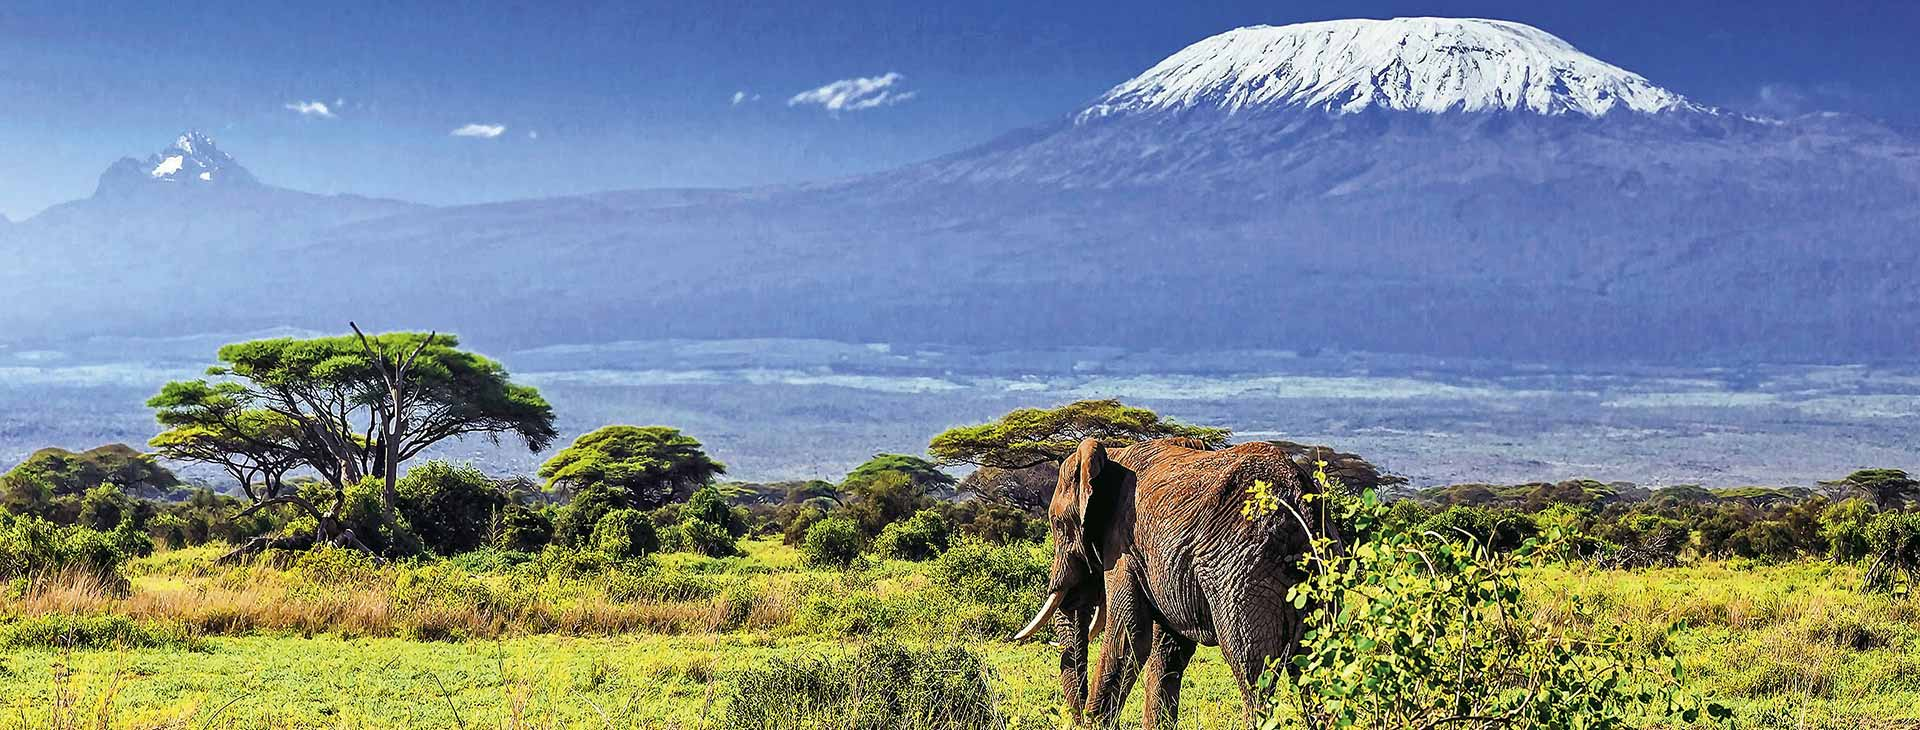 Powitanie z Afryką / Indian Ocean